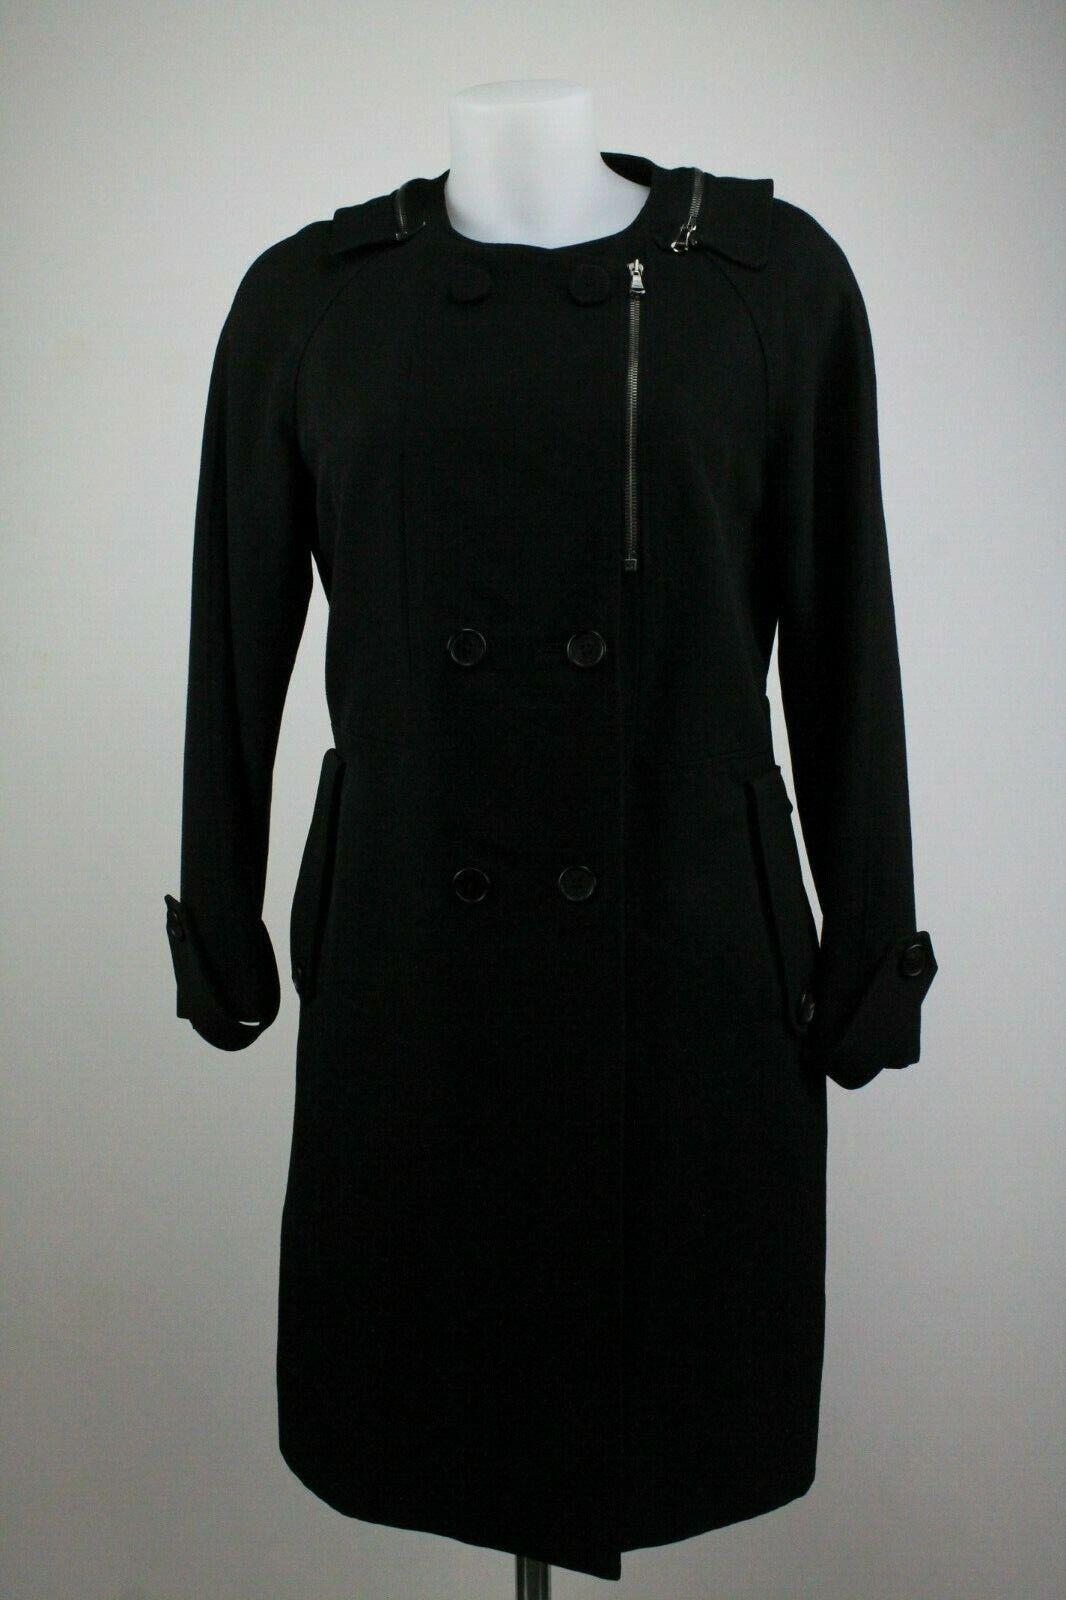 3.1 Phillip Lim Pea Pea Pea Trench Coat,Größe  UK10 EU38. | Ruf zuerst  537595